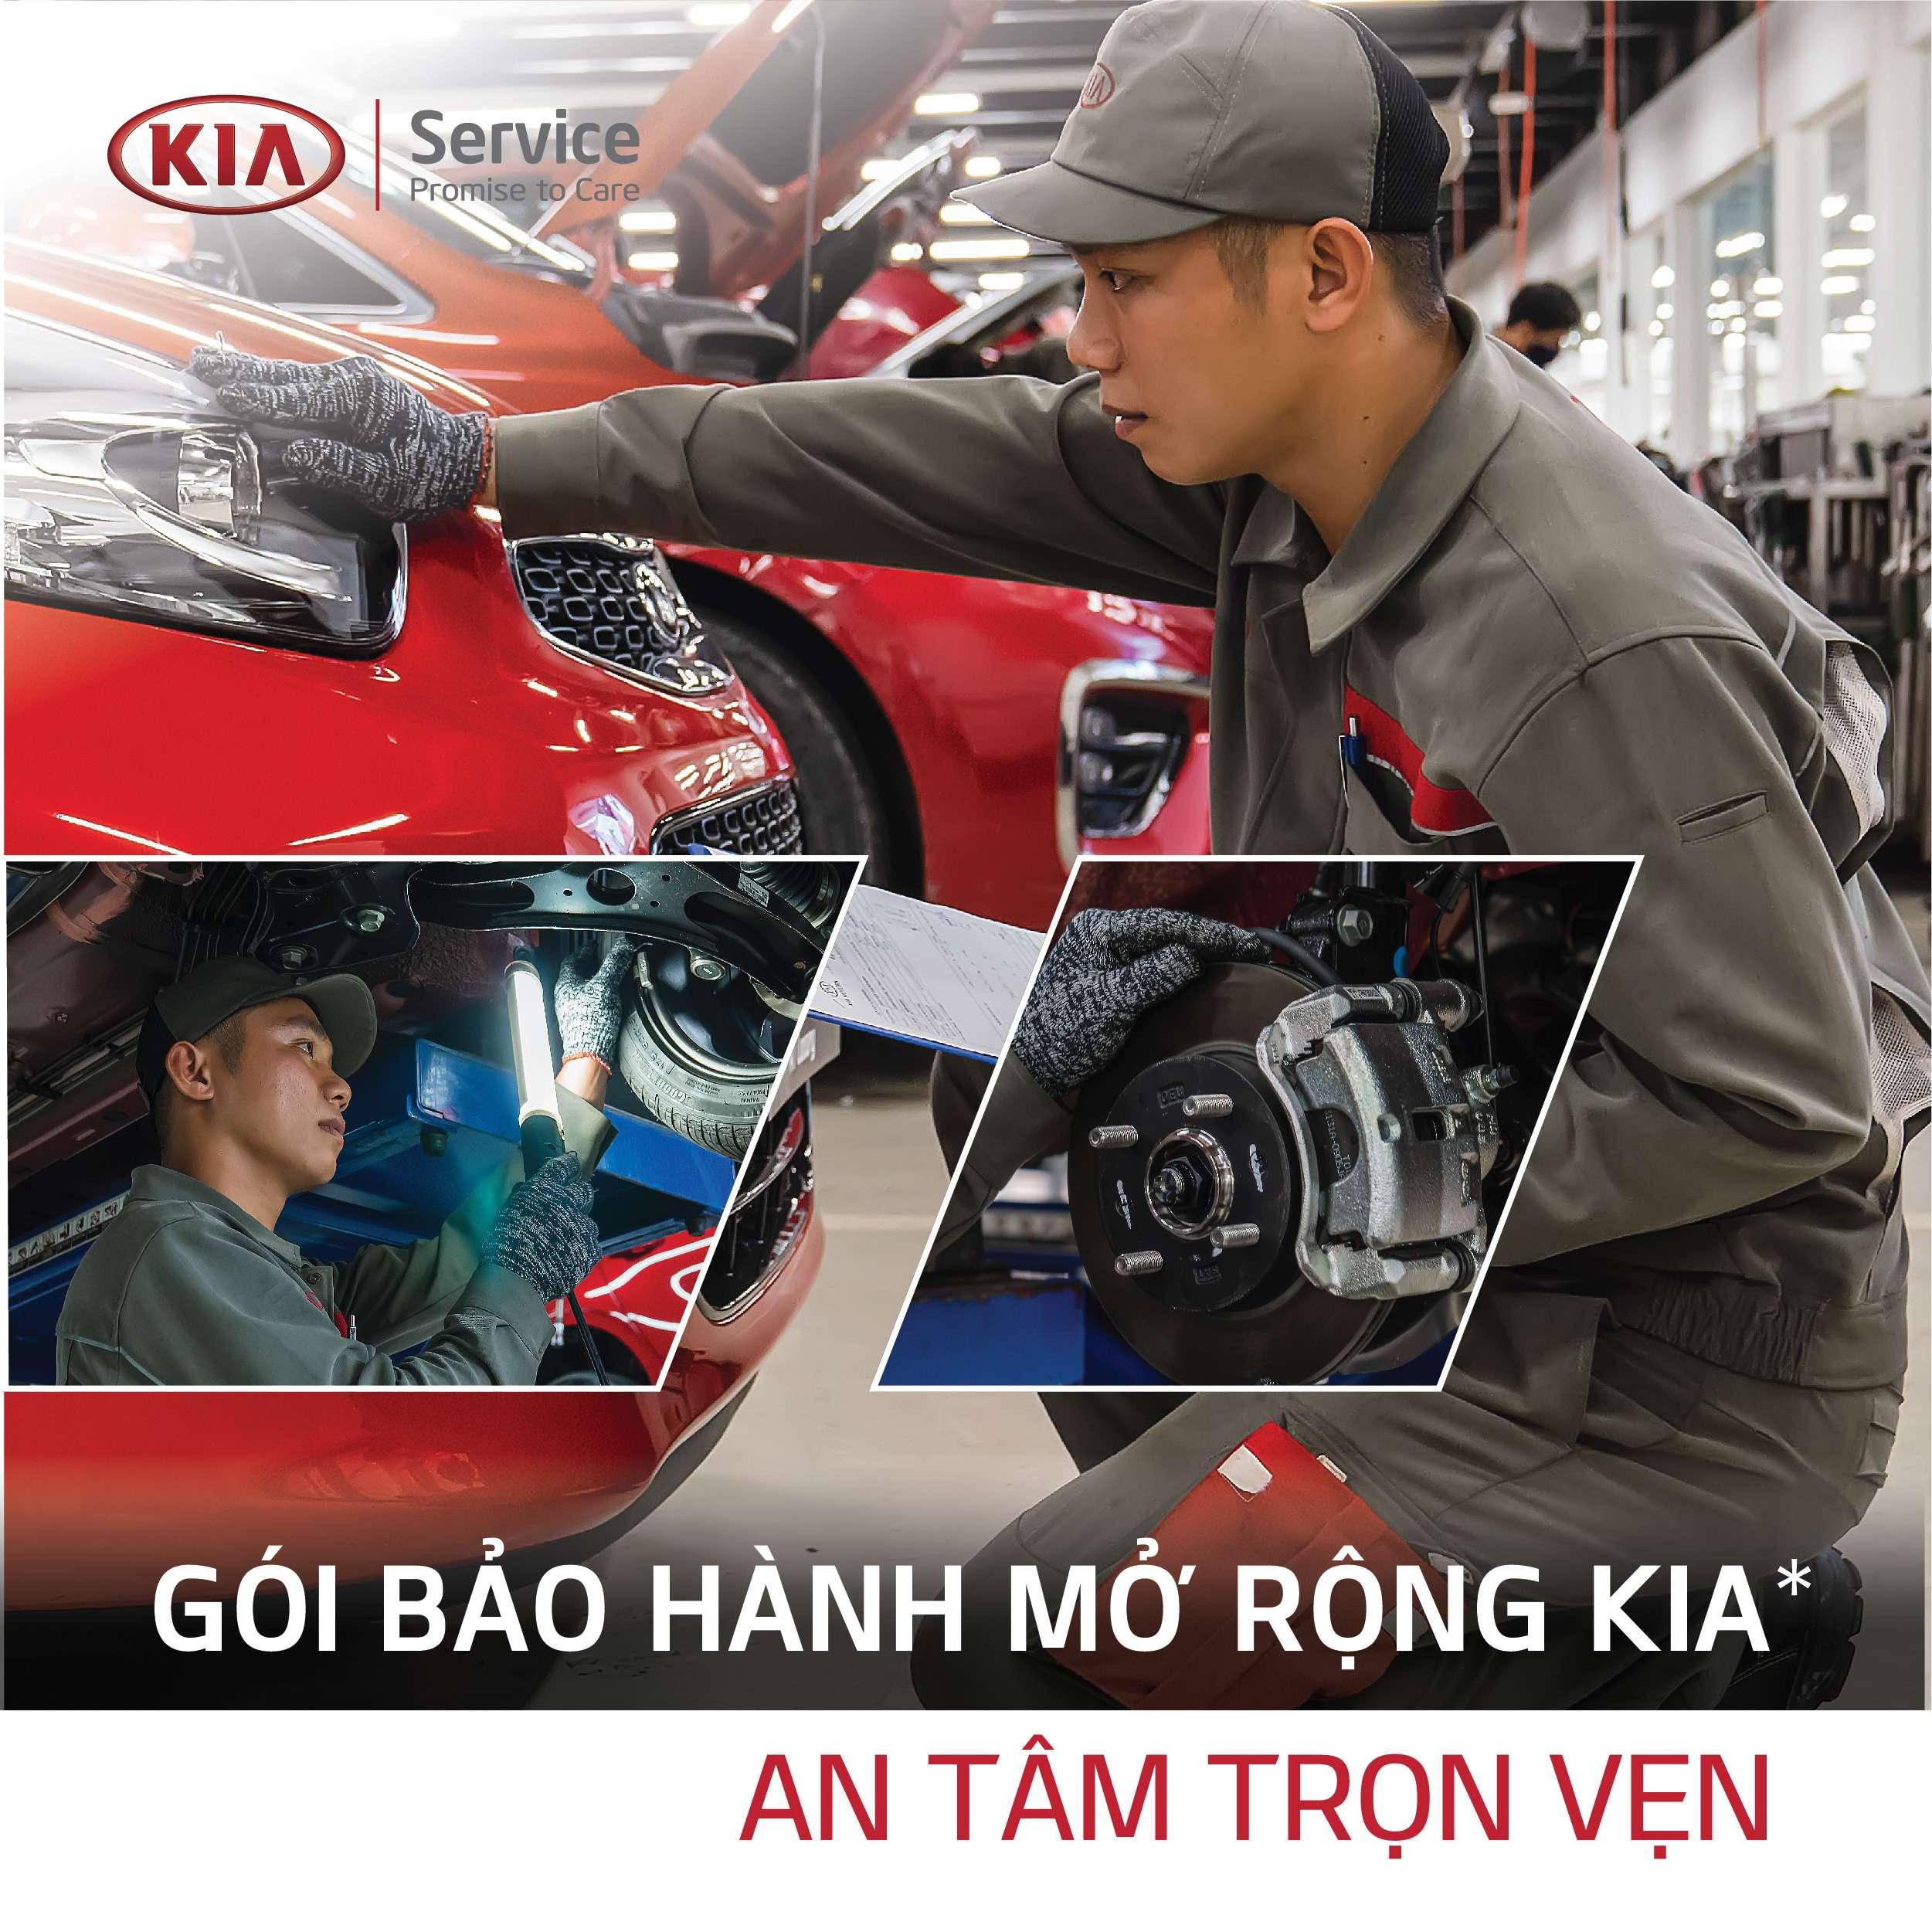 K2 GÓI BAO HANH MO RONG KIA